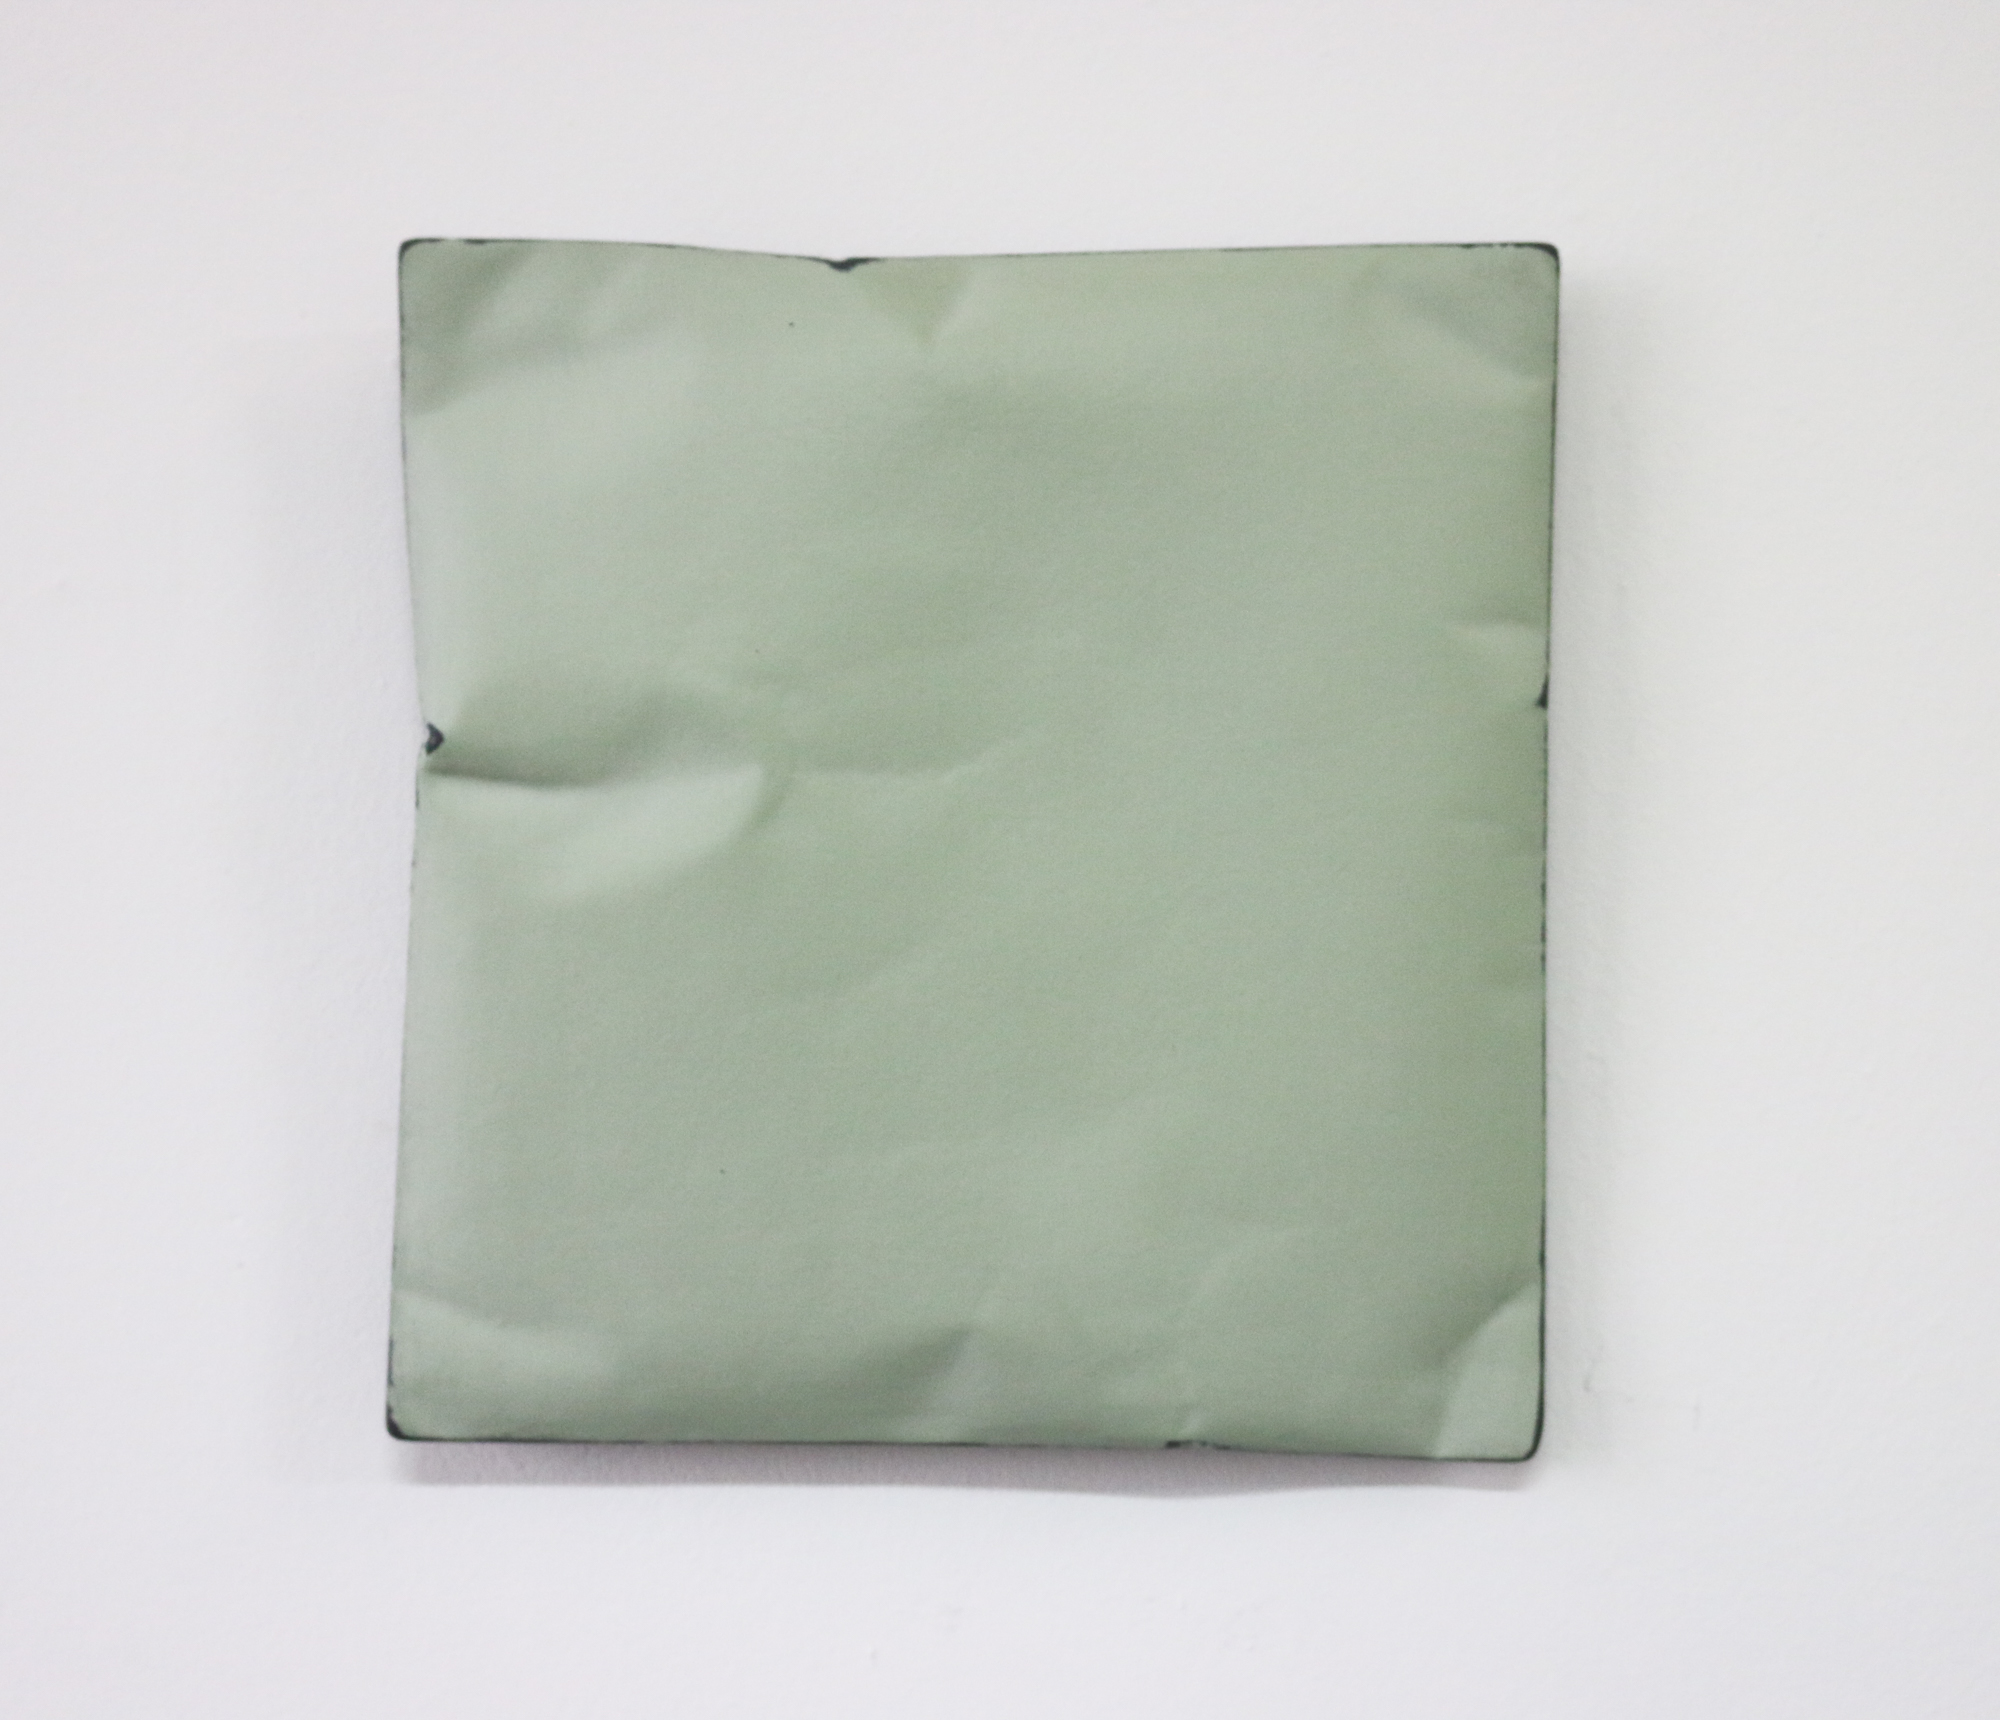 Johan De Wit, Untitled, 2018, Paper, Resin, Marble, Acrylic, 22 x 21 x 4 cm